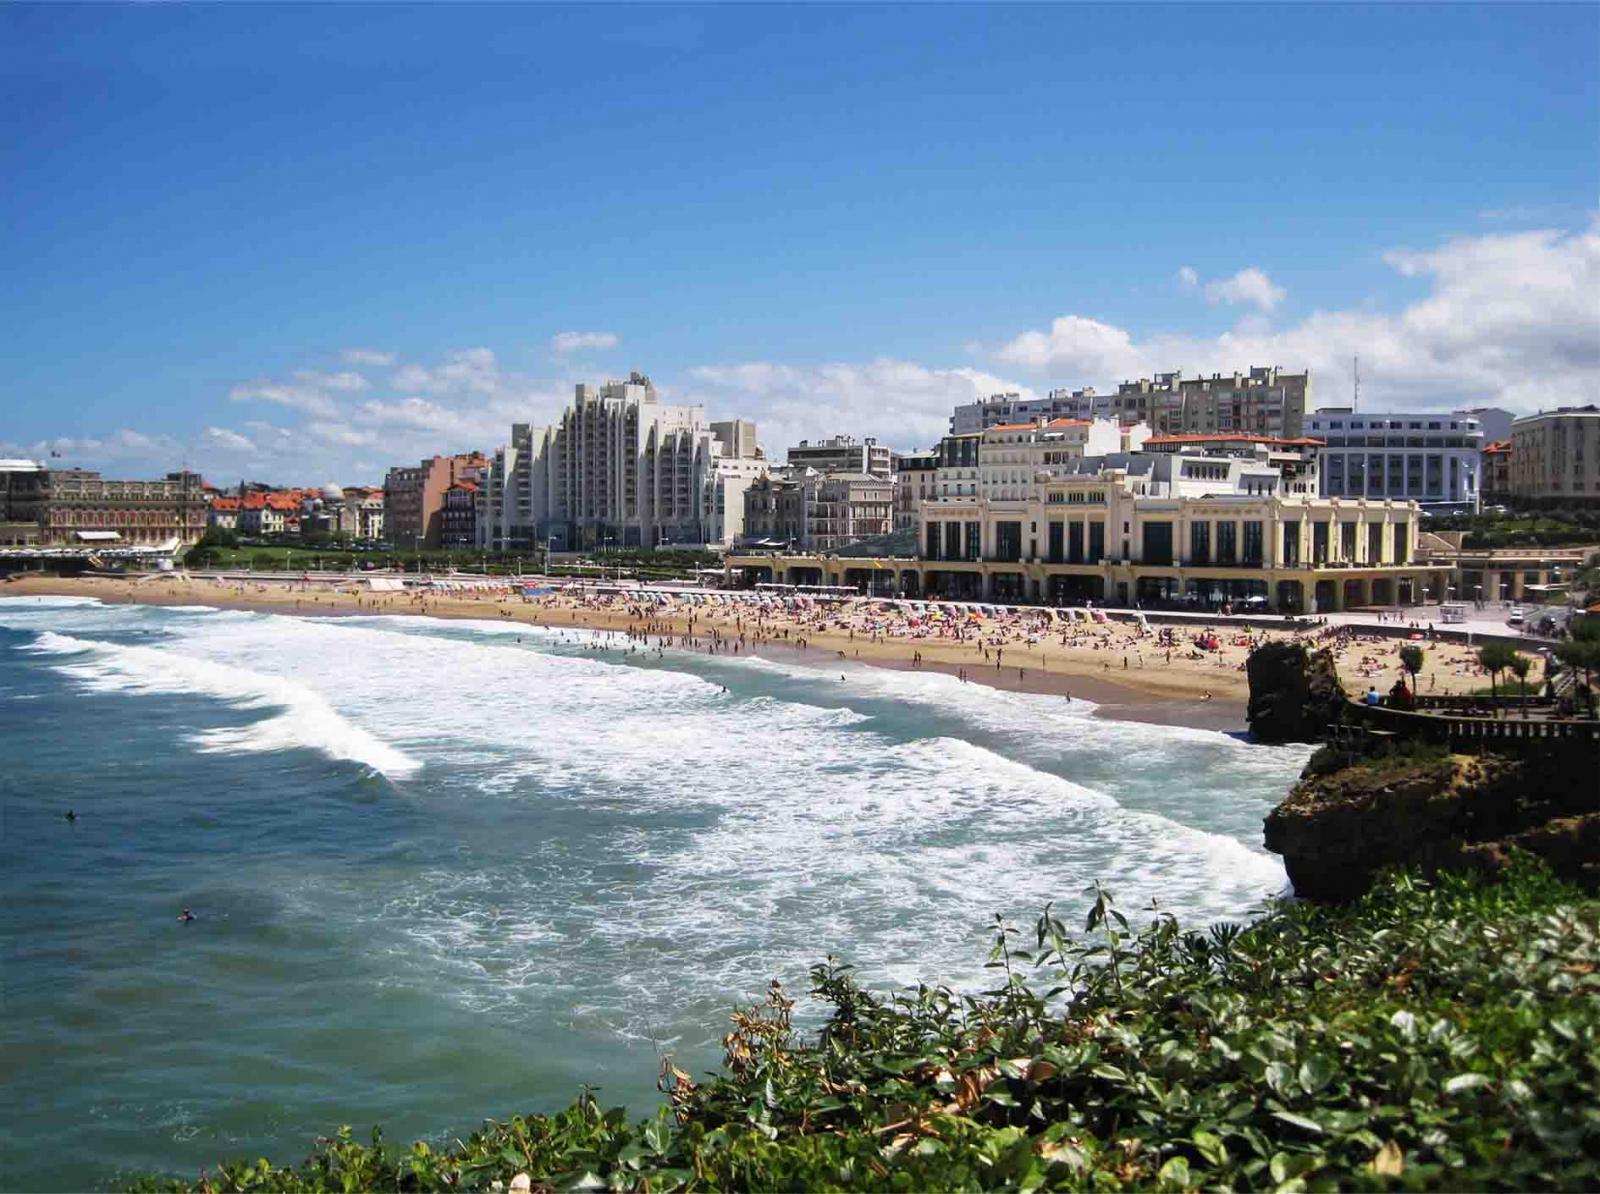 Le baccara casino biarritz